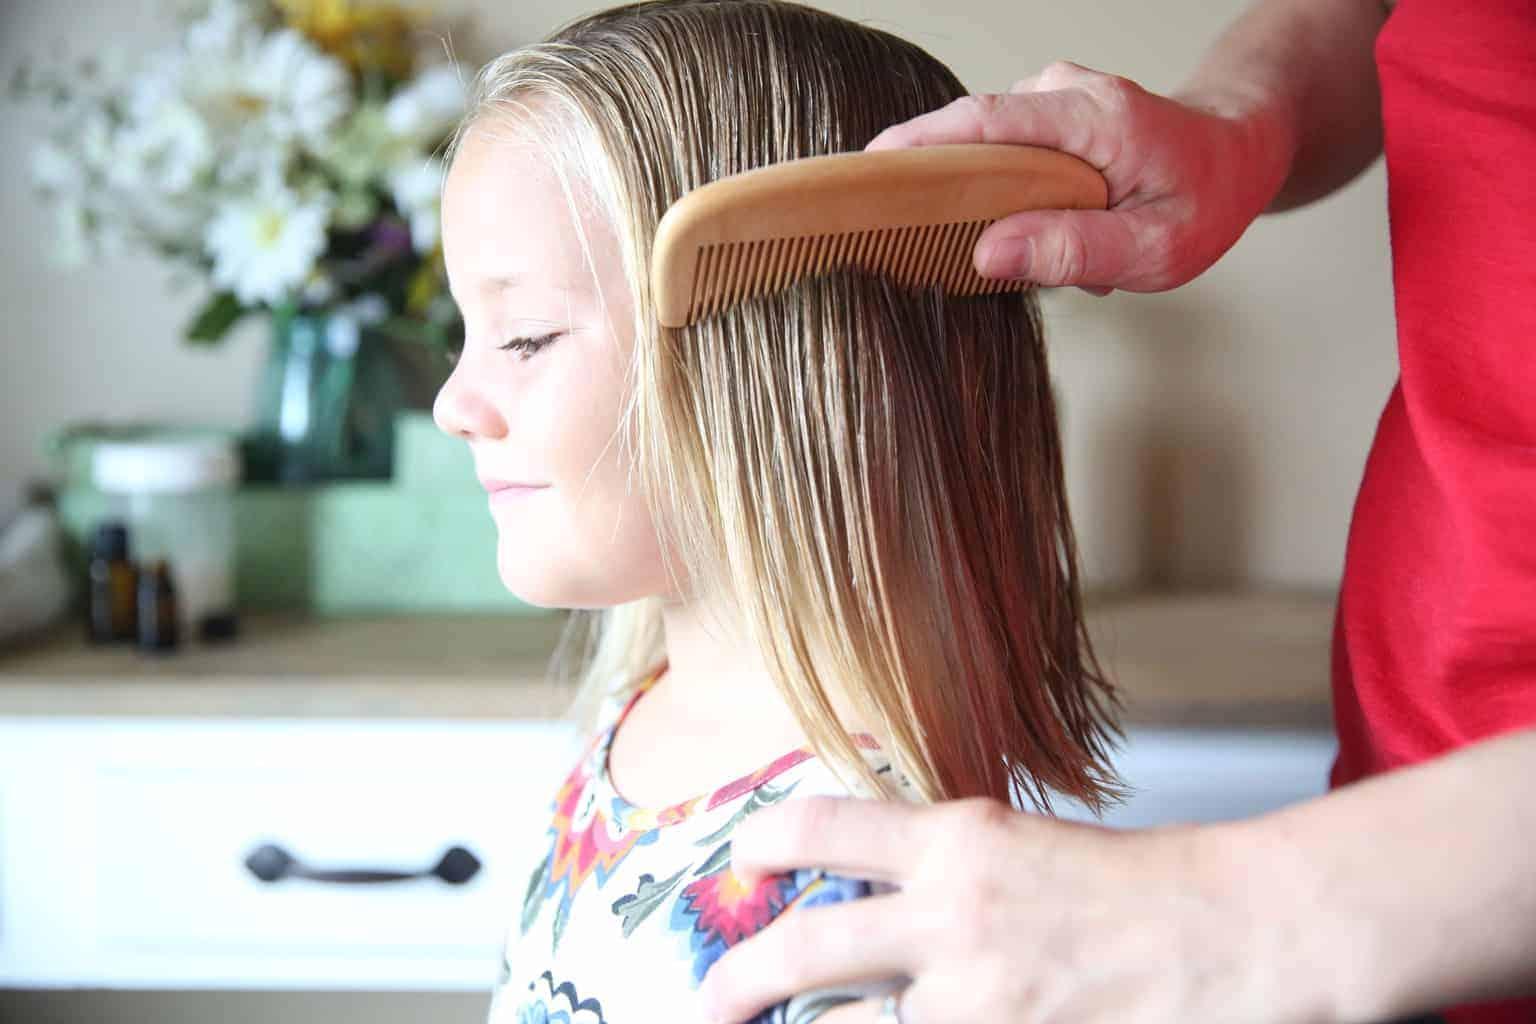 DIY Hair Detangler Spray - Our Oily House